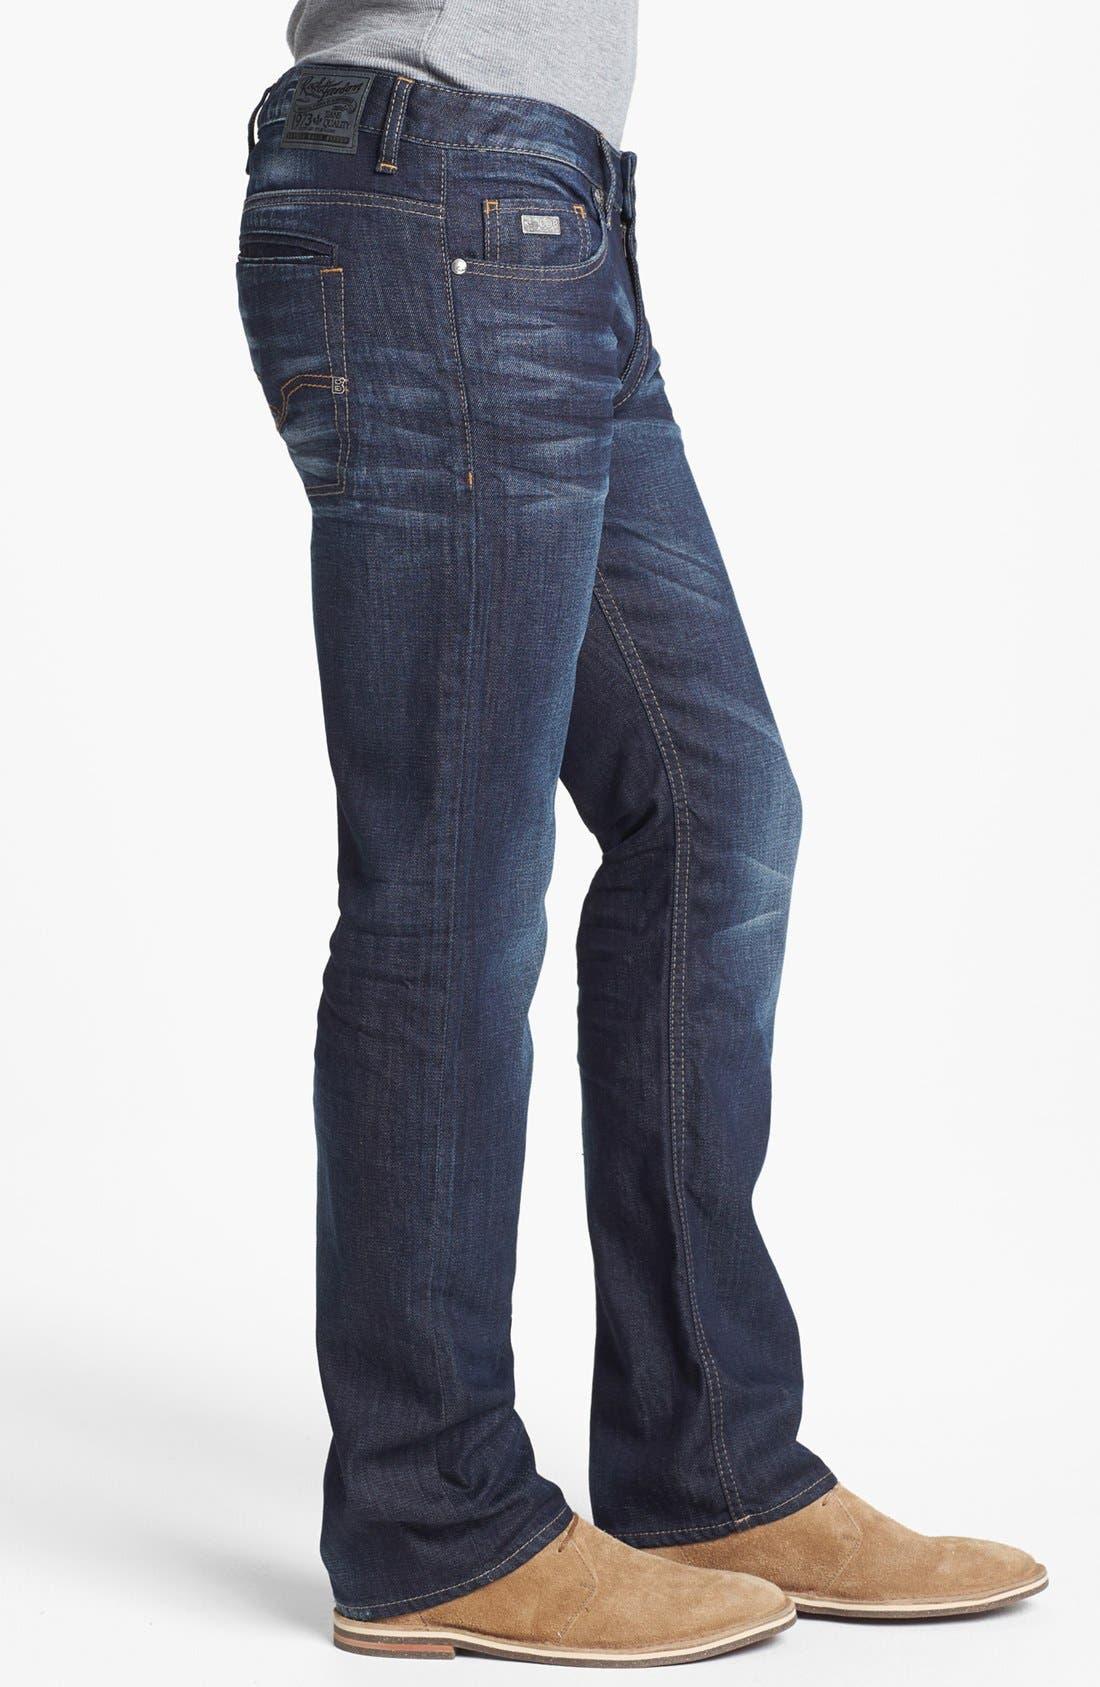 Alternate Image 3  - Buffalo Jeans 'Six' Straight Leg Jeans (Slightly Washed)